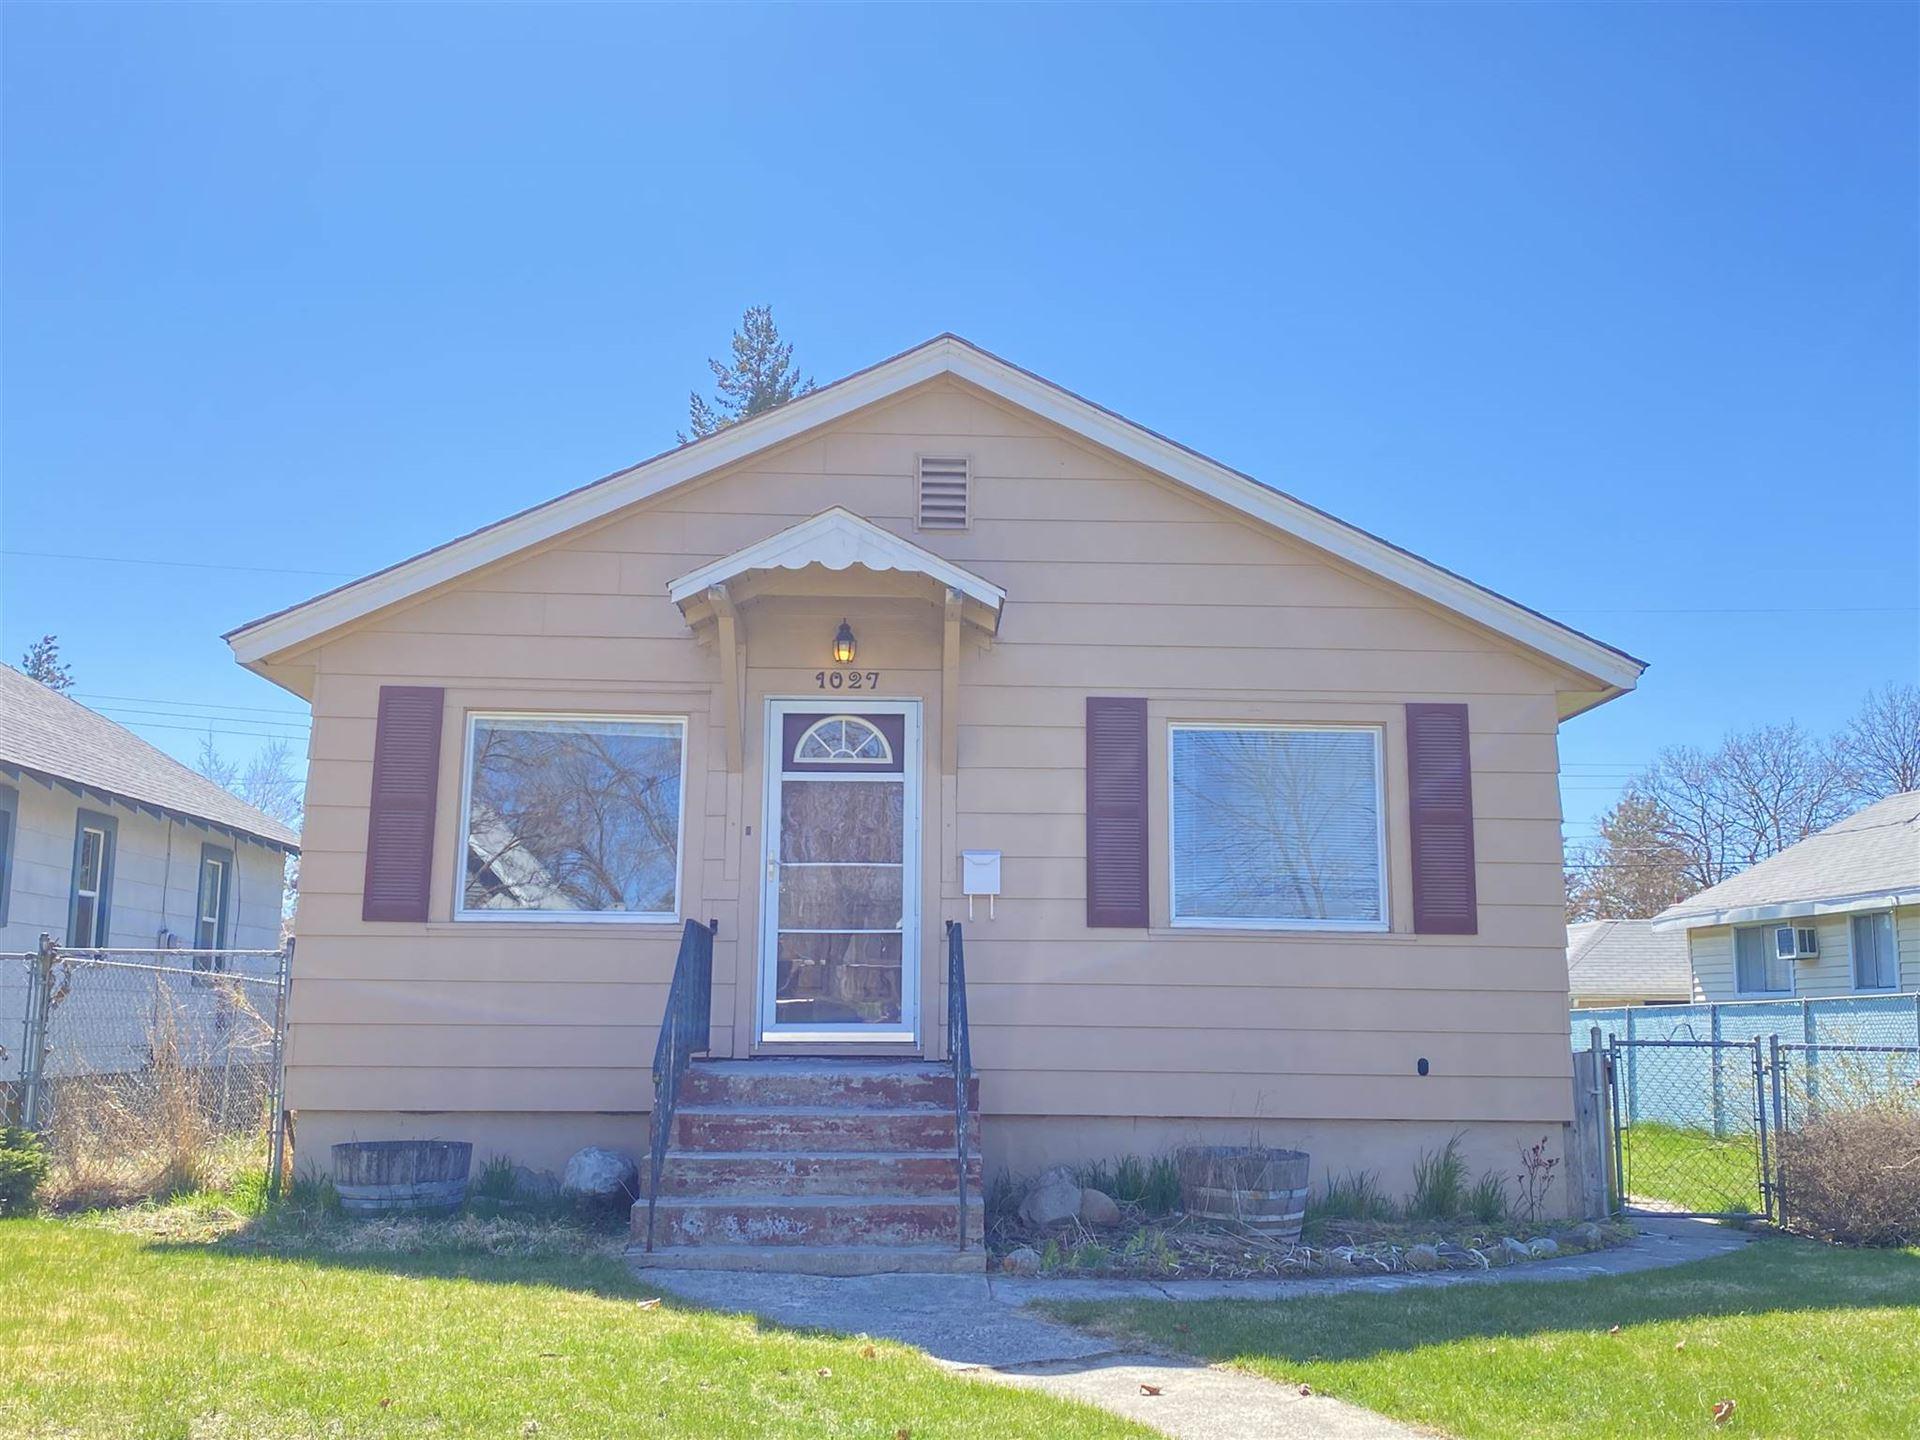 1027 W Providence Ave, Spokane, WA 99205 - #: 202113935